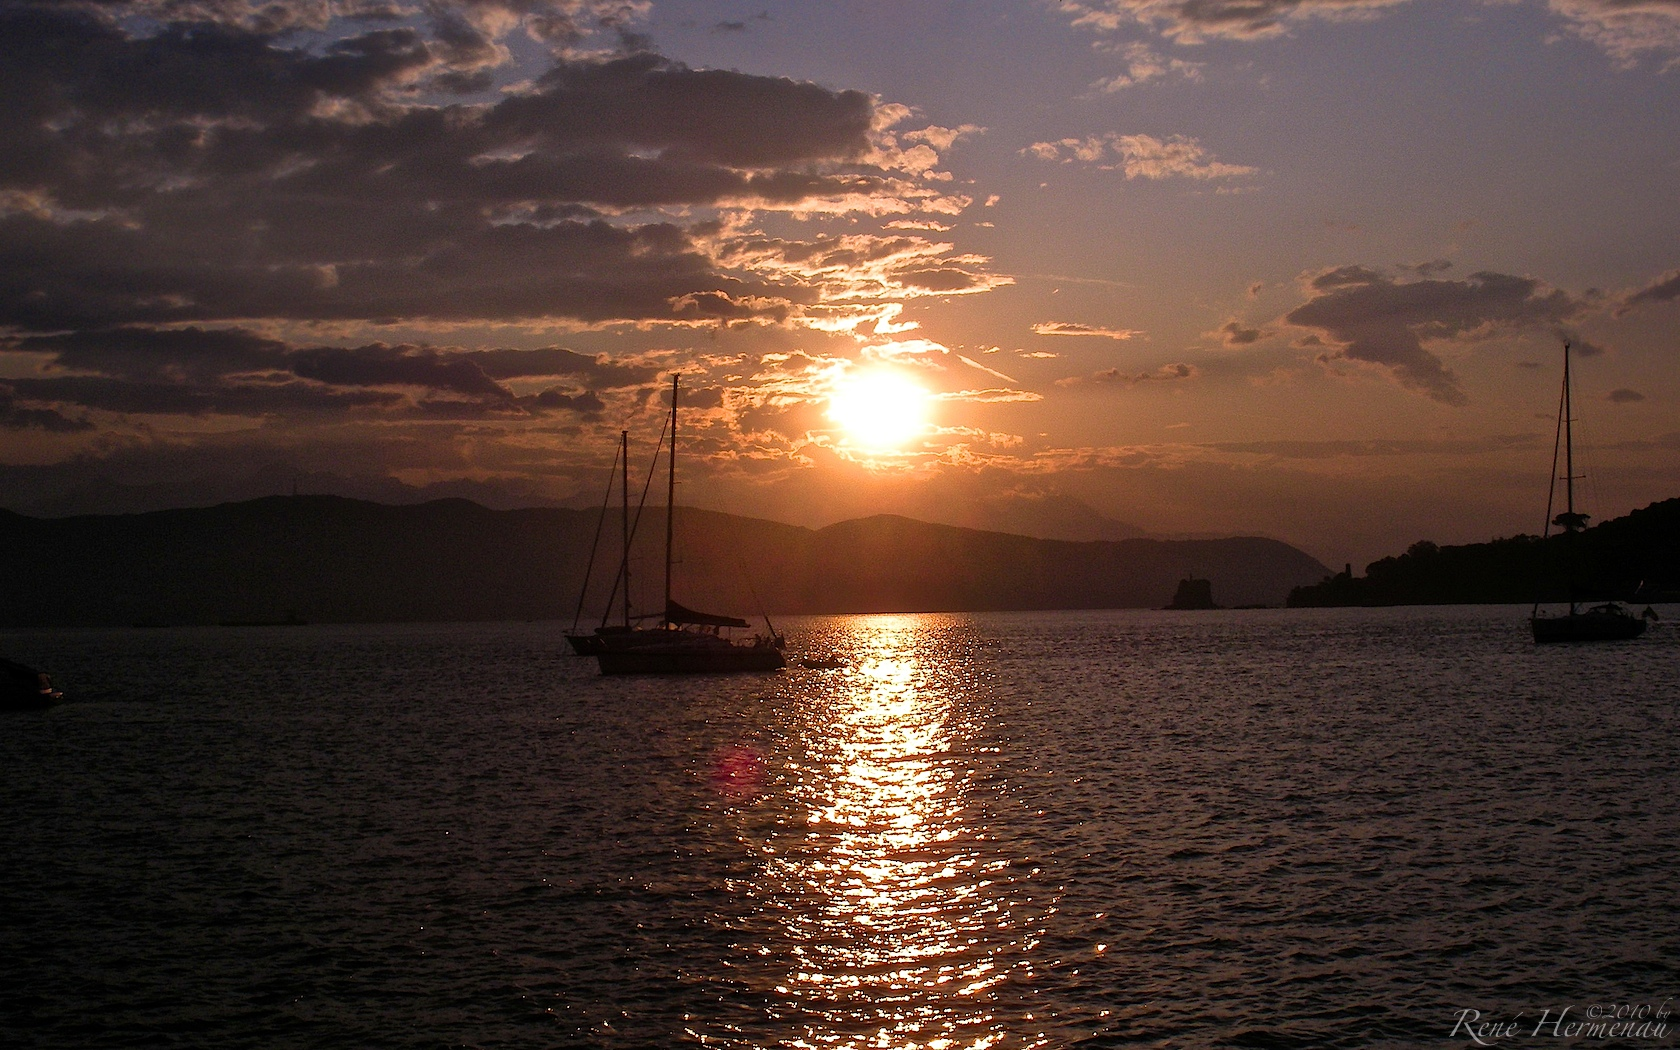 Sunset Athmosphere